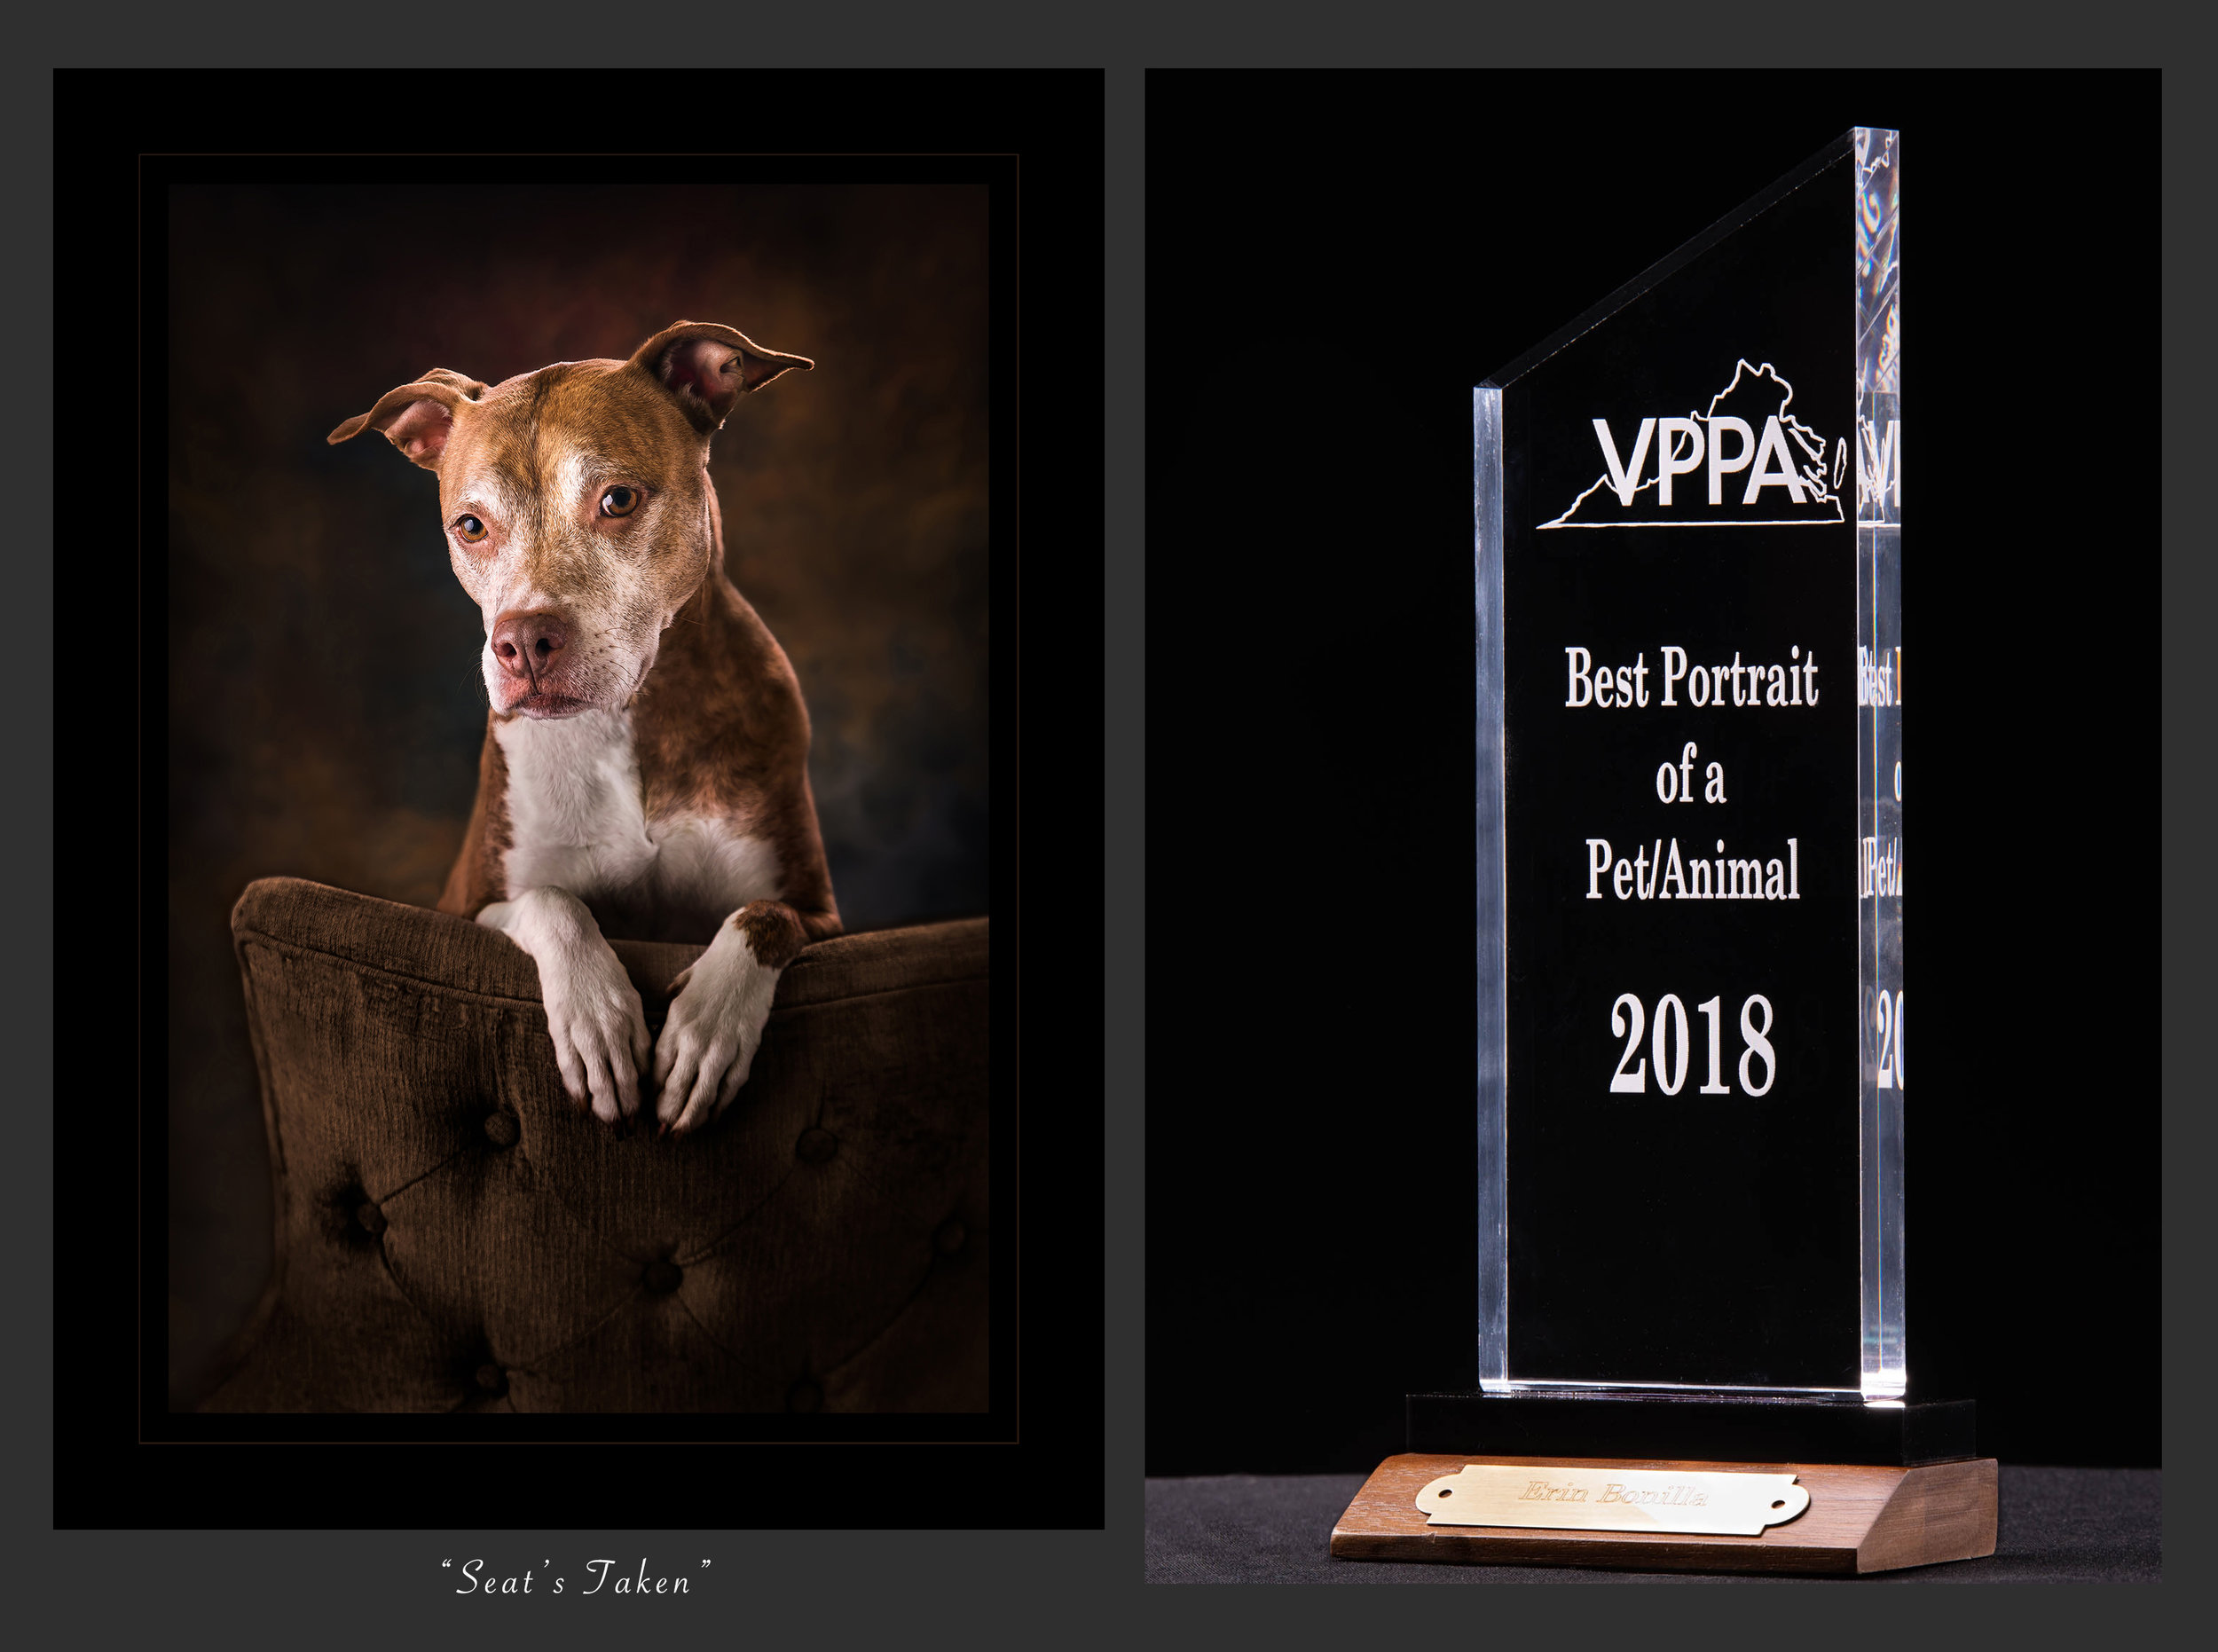 Virginia Professional Photographers Association2018Best Portrait of aPet/Animal -